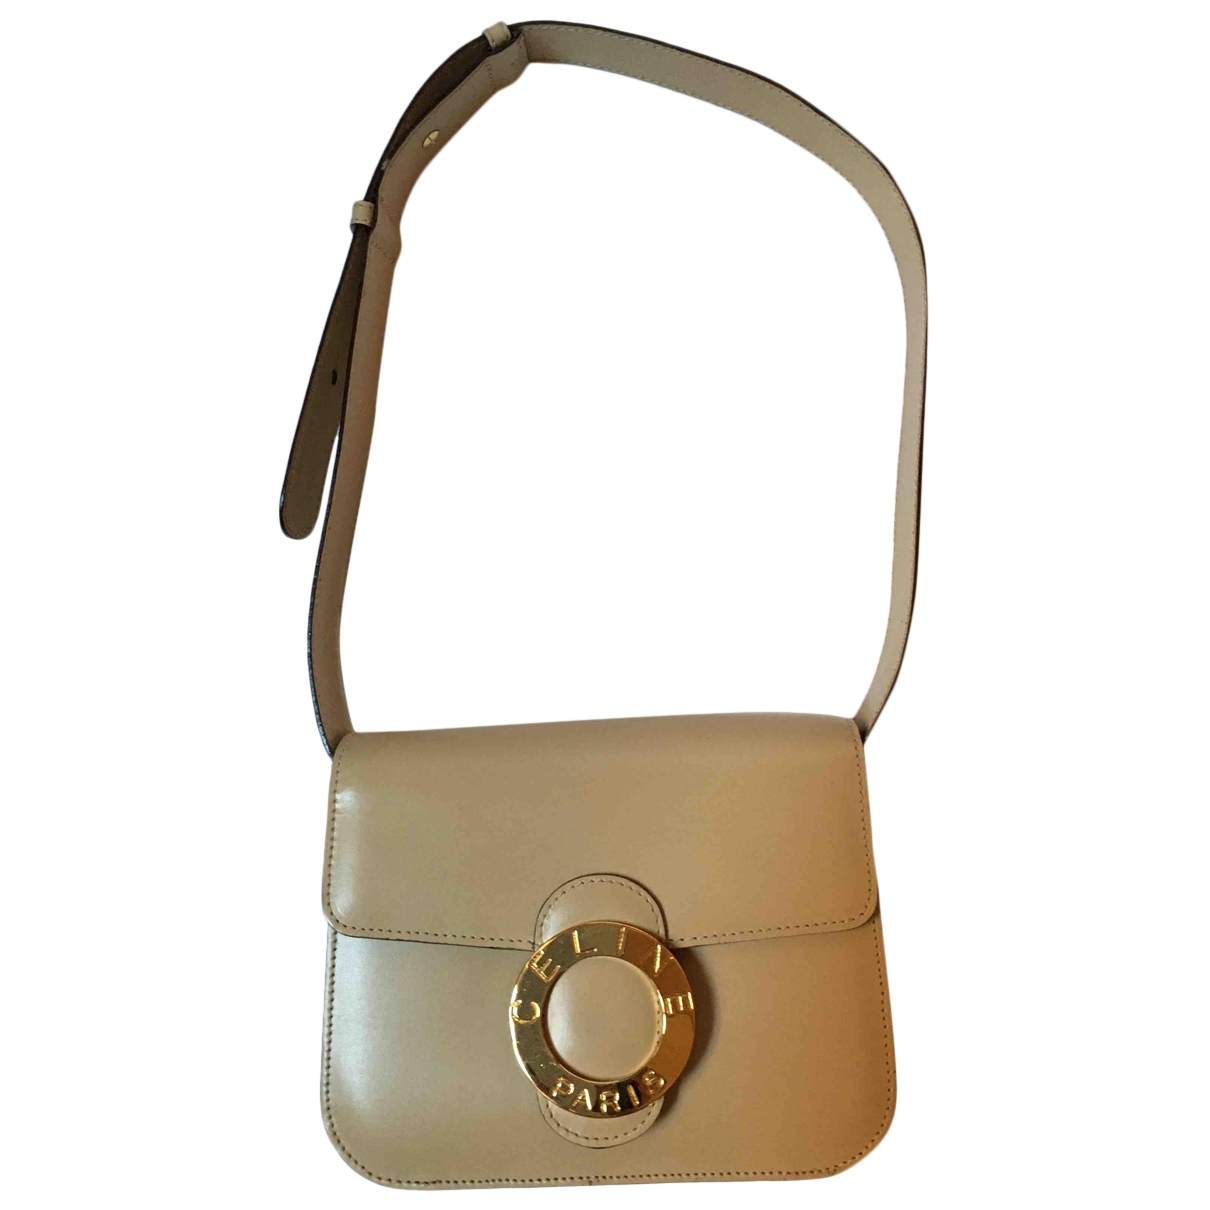 Celine \N Handtasche in  Ecru Leder